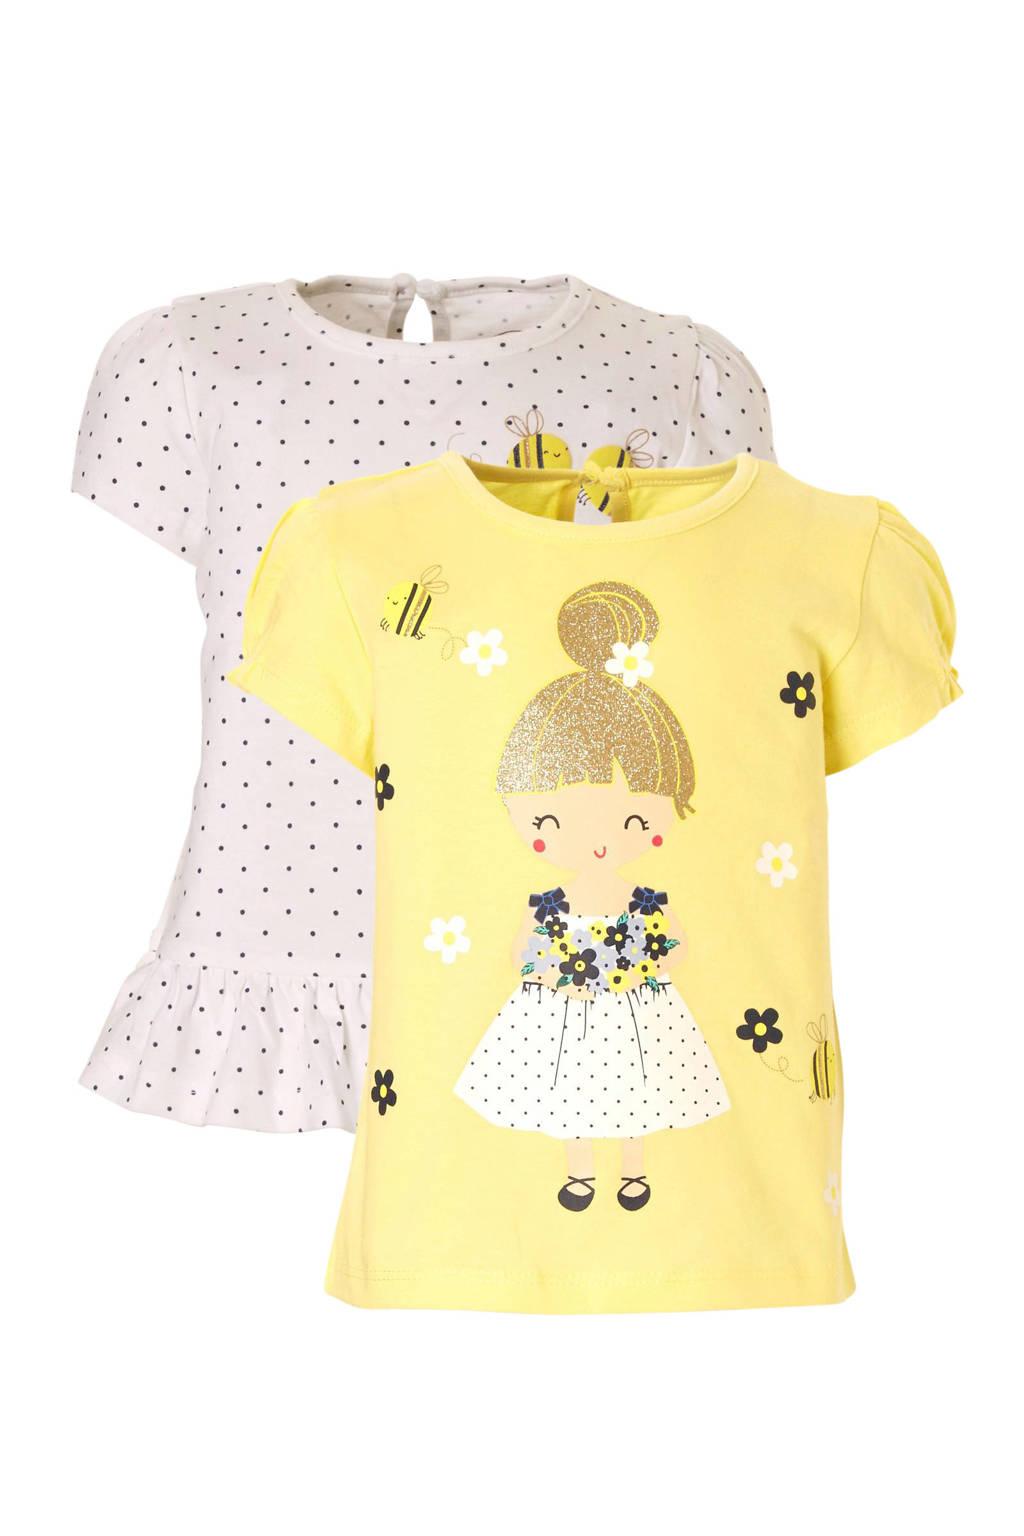 C&A Baby Club T-shirt - set van 2, Geel